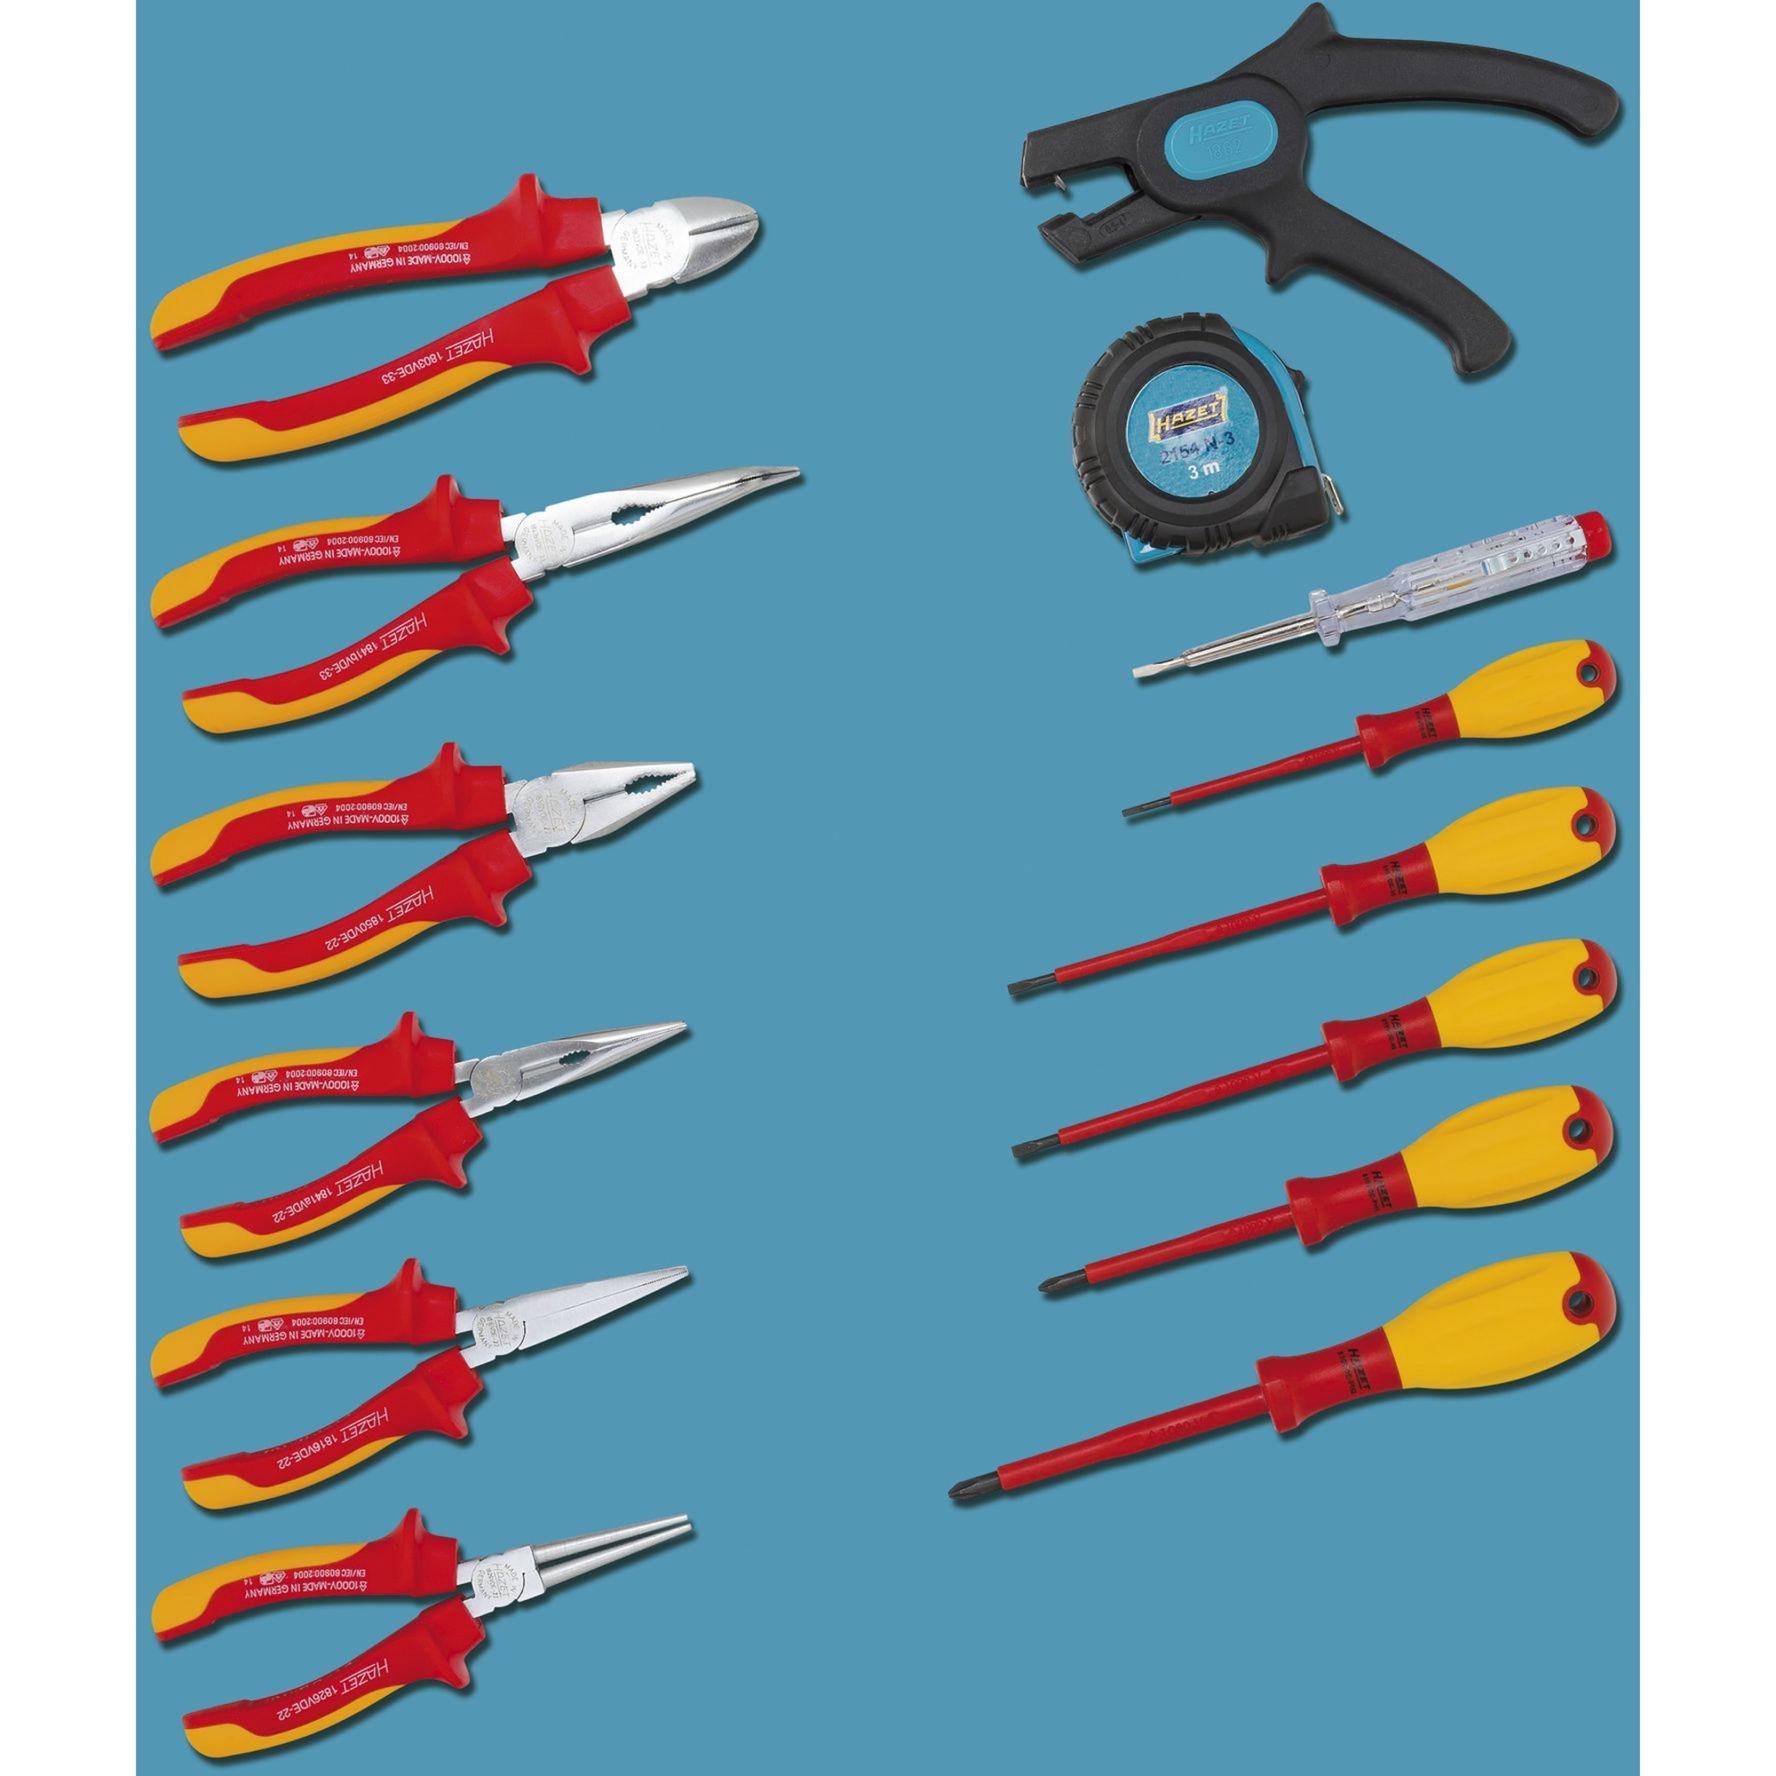 0-20/14, Kit de herramientas